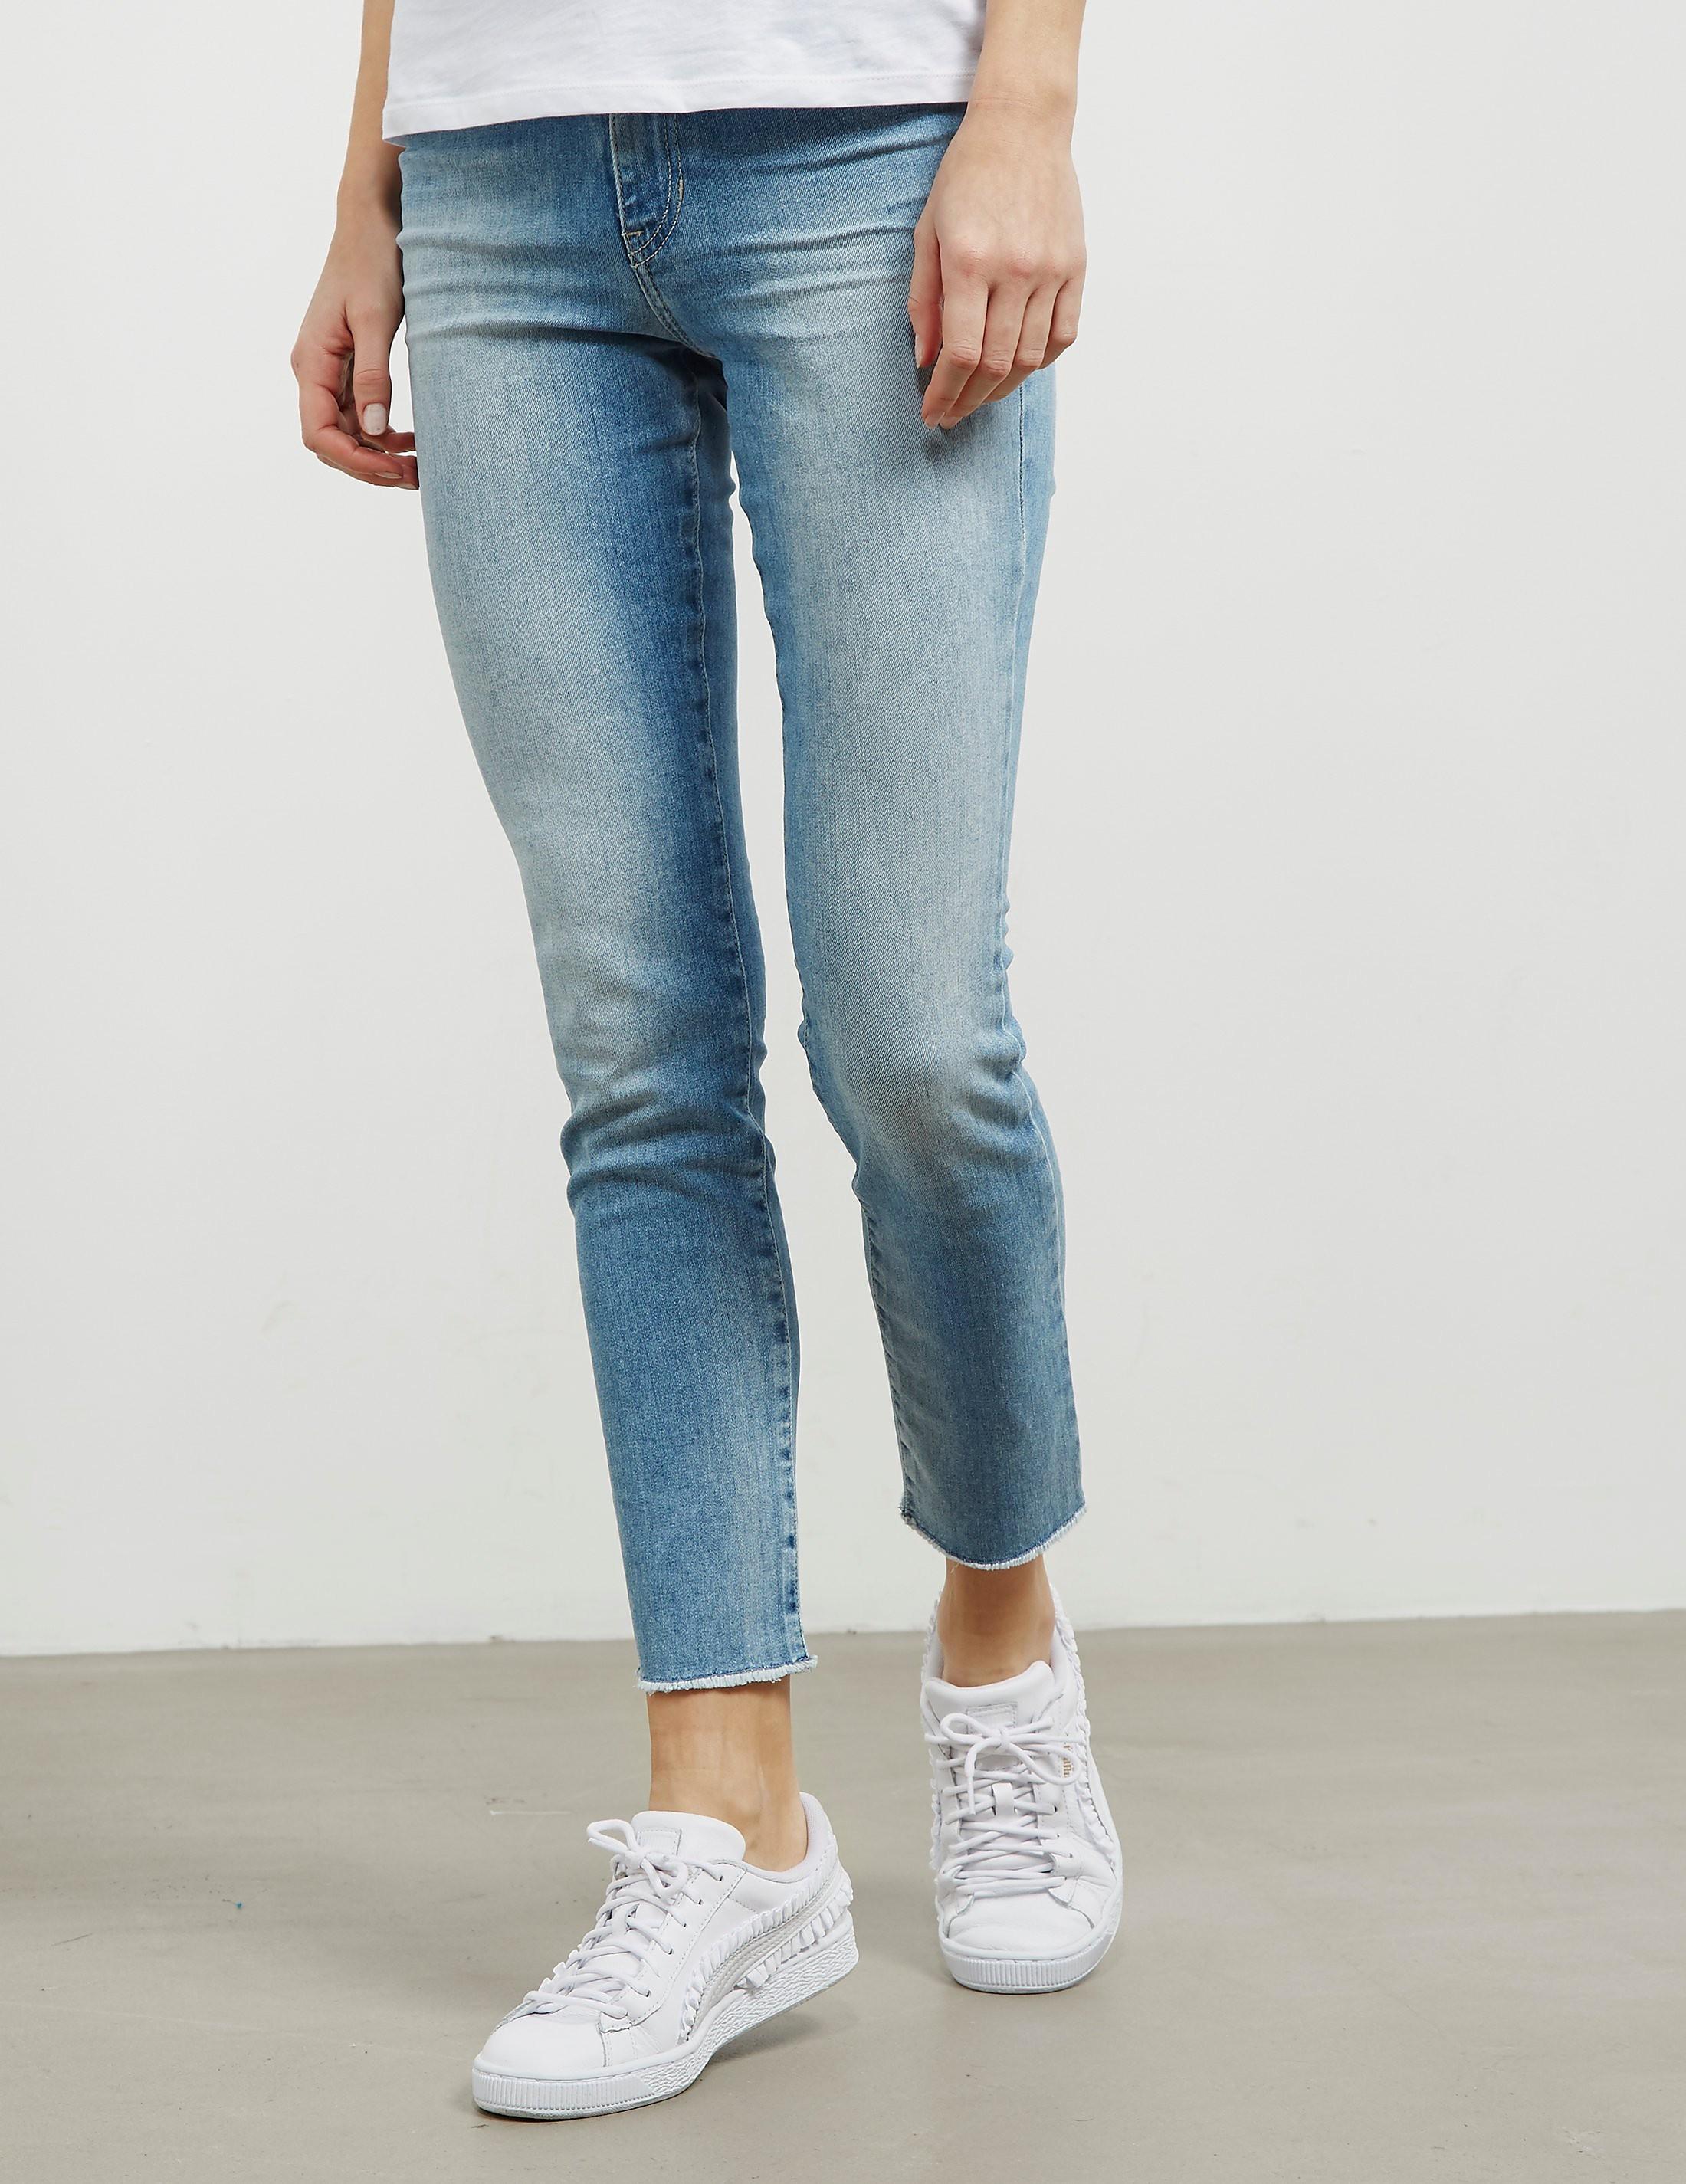 BOSS J11 Skinny Jeans